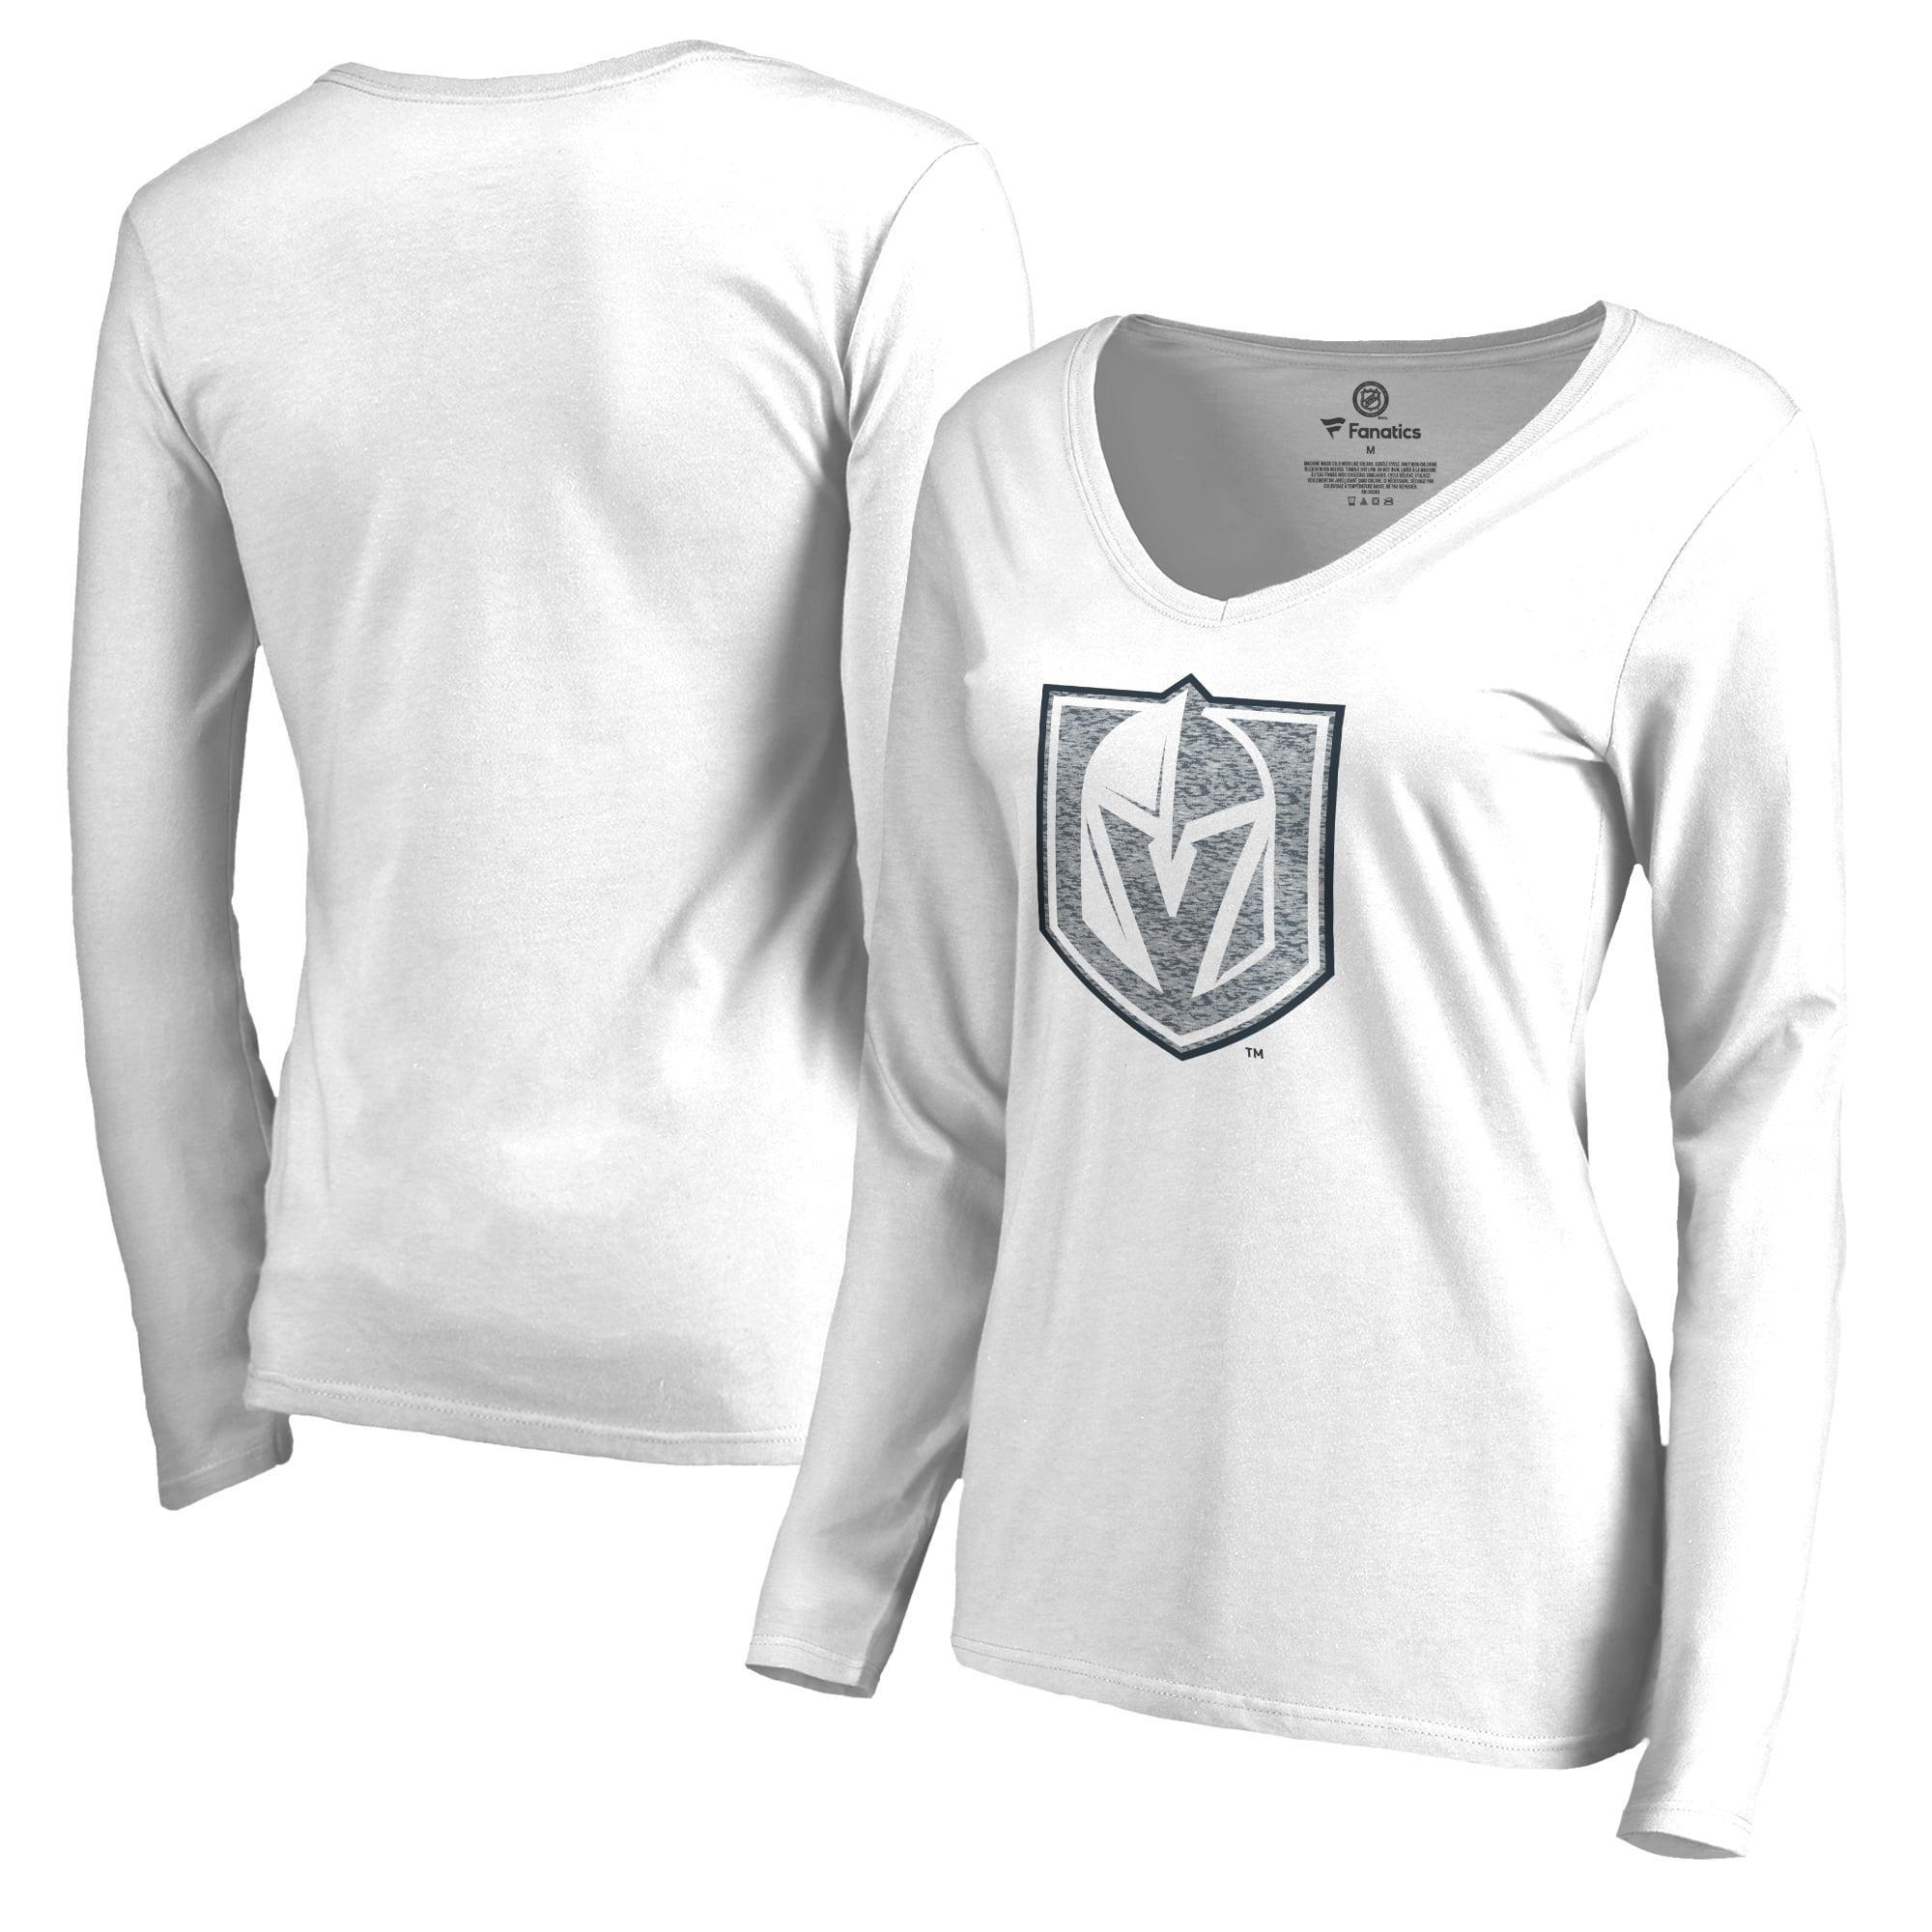 Vegas Golden Knights Fanatics Branded Women's White Out Long Sleeve T-Shirt White by Football Fanatics/Ruppshirts